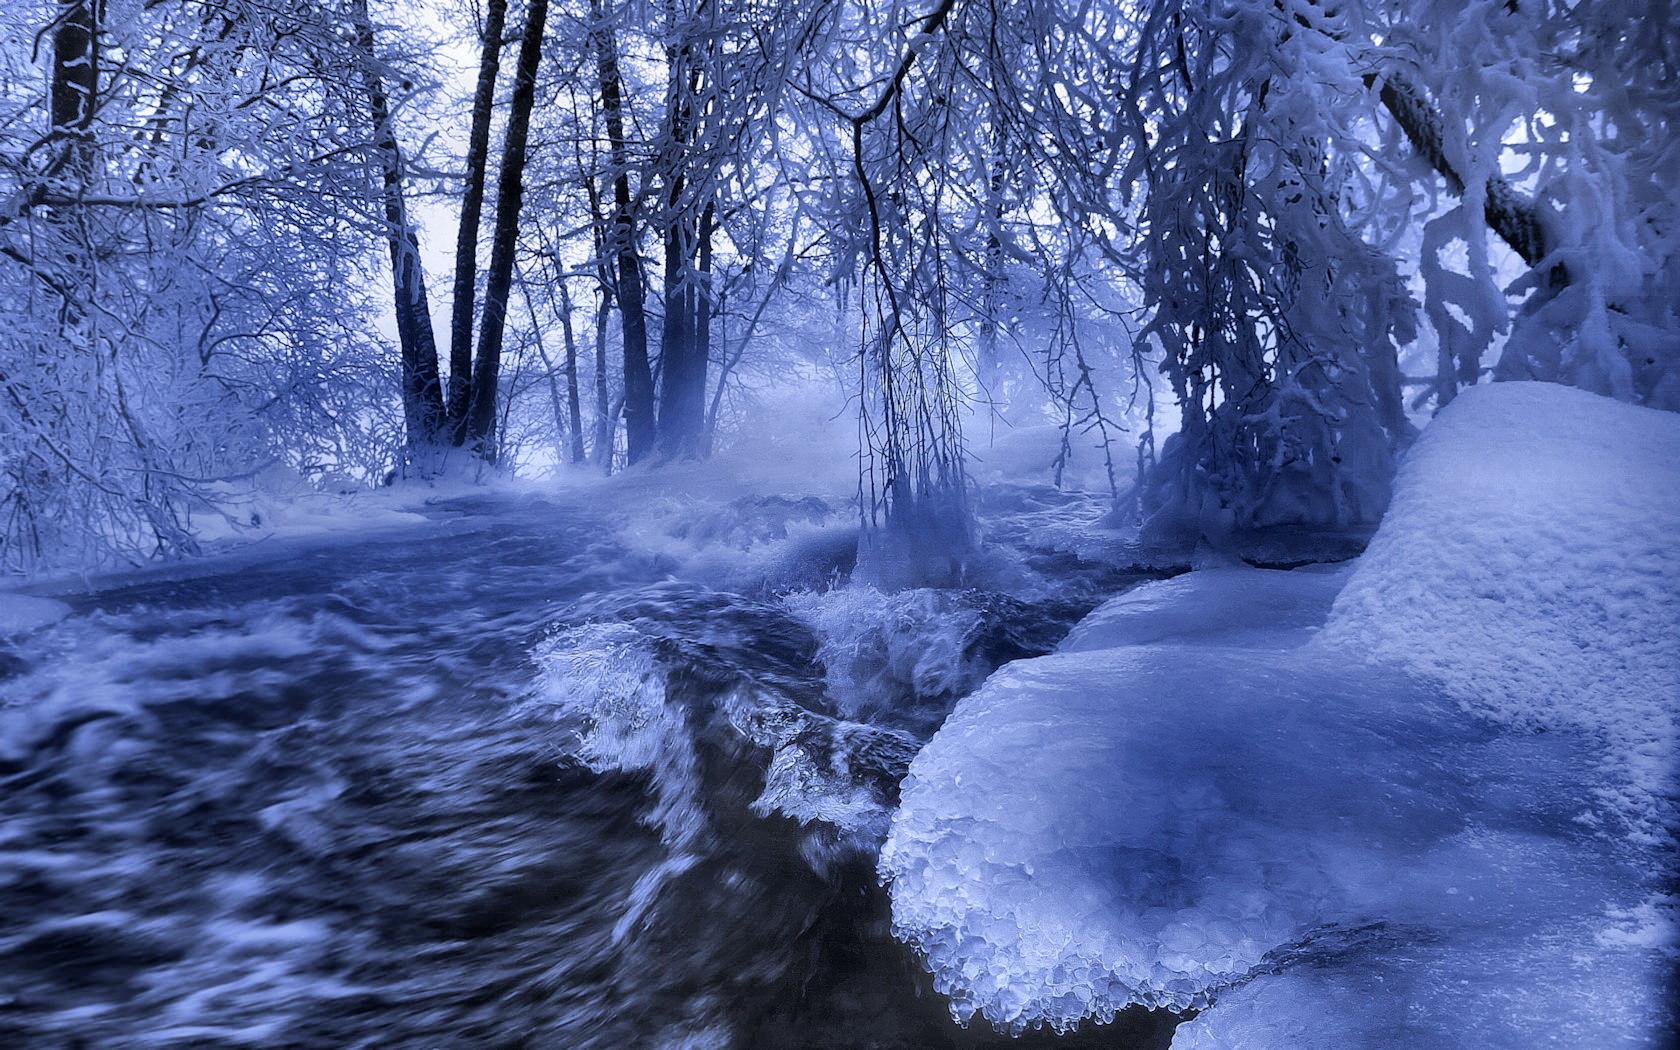 winter scene wallpaper 2015   Grasscloth Wallpaper 1680x1050